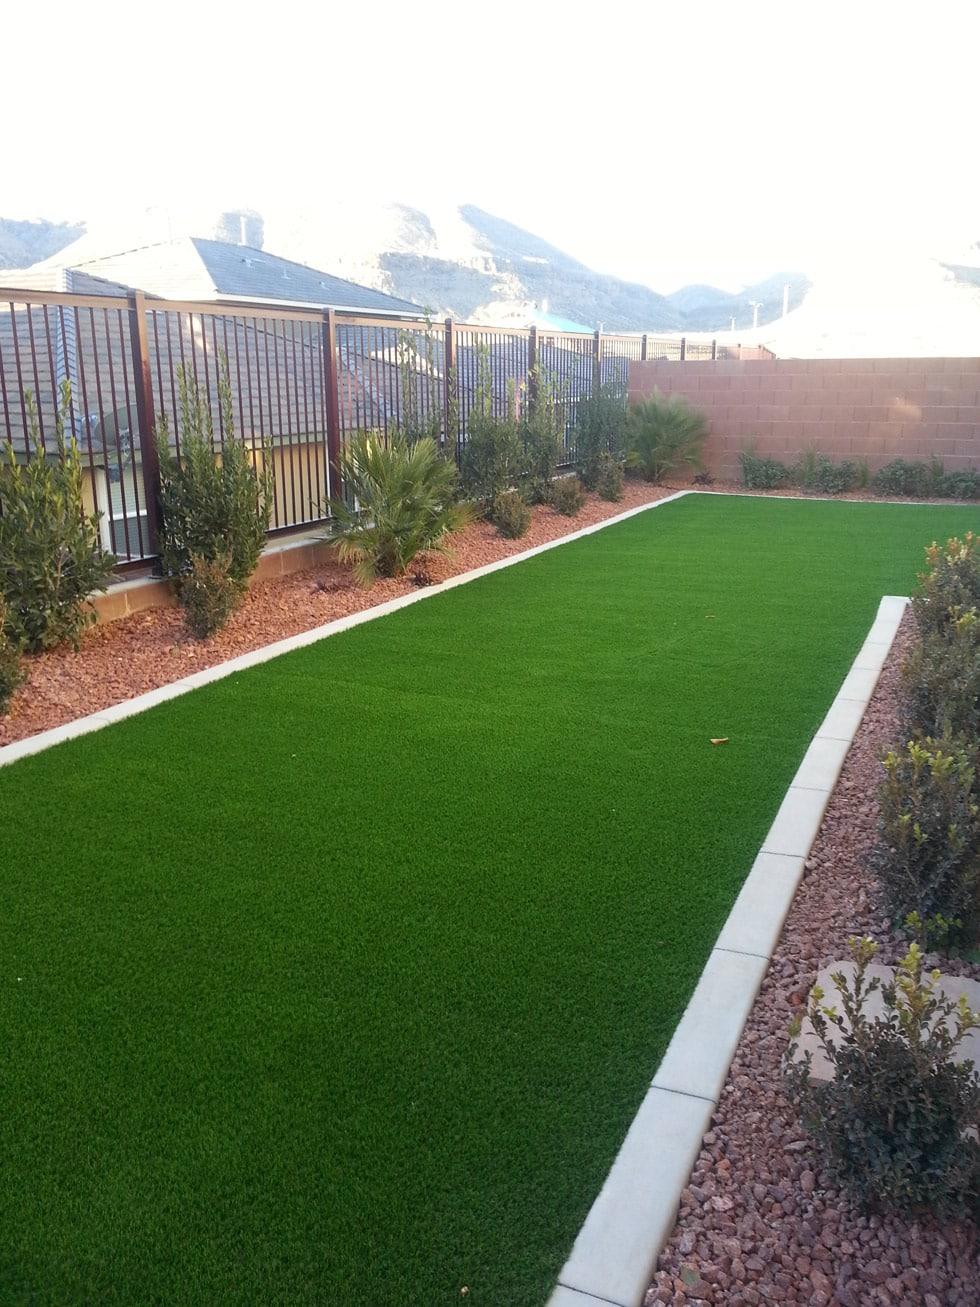 Astro Turf Garden >> Artificial Turf & Concrete Border - Cacti Landscapes